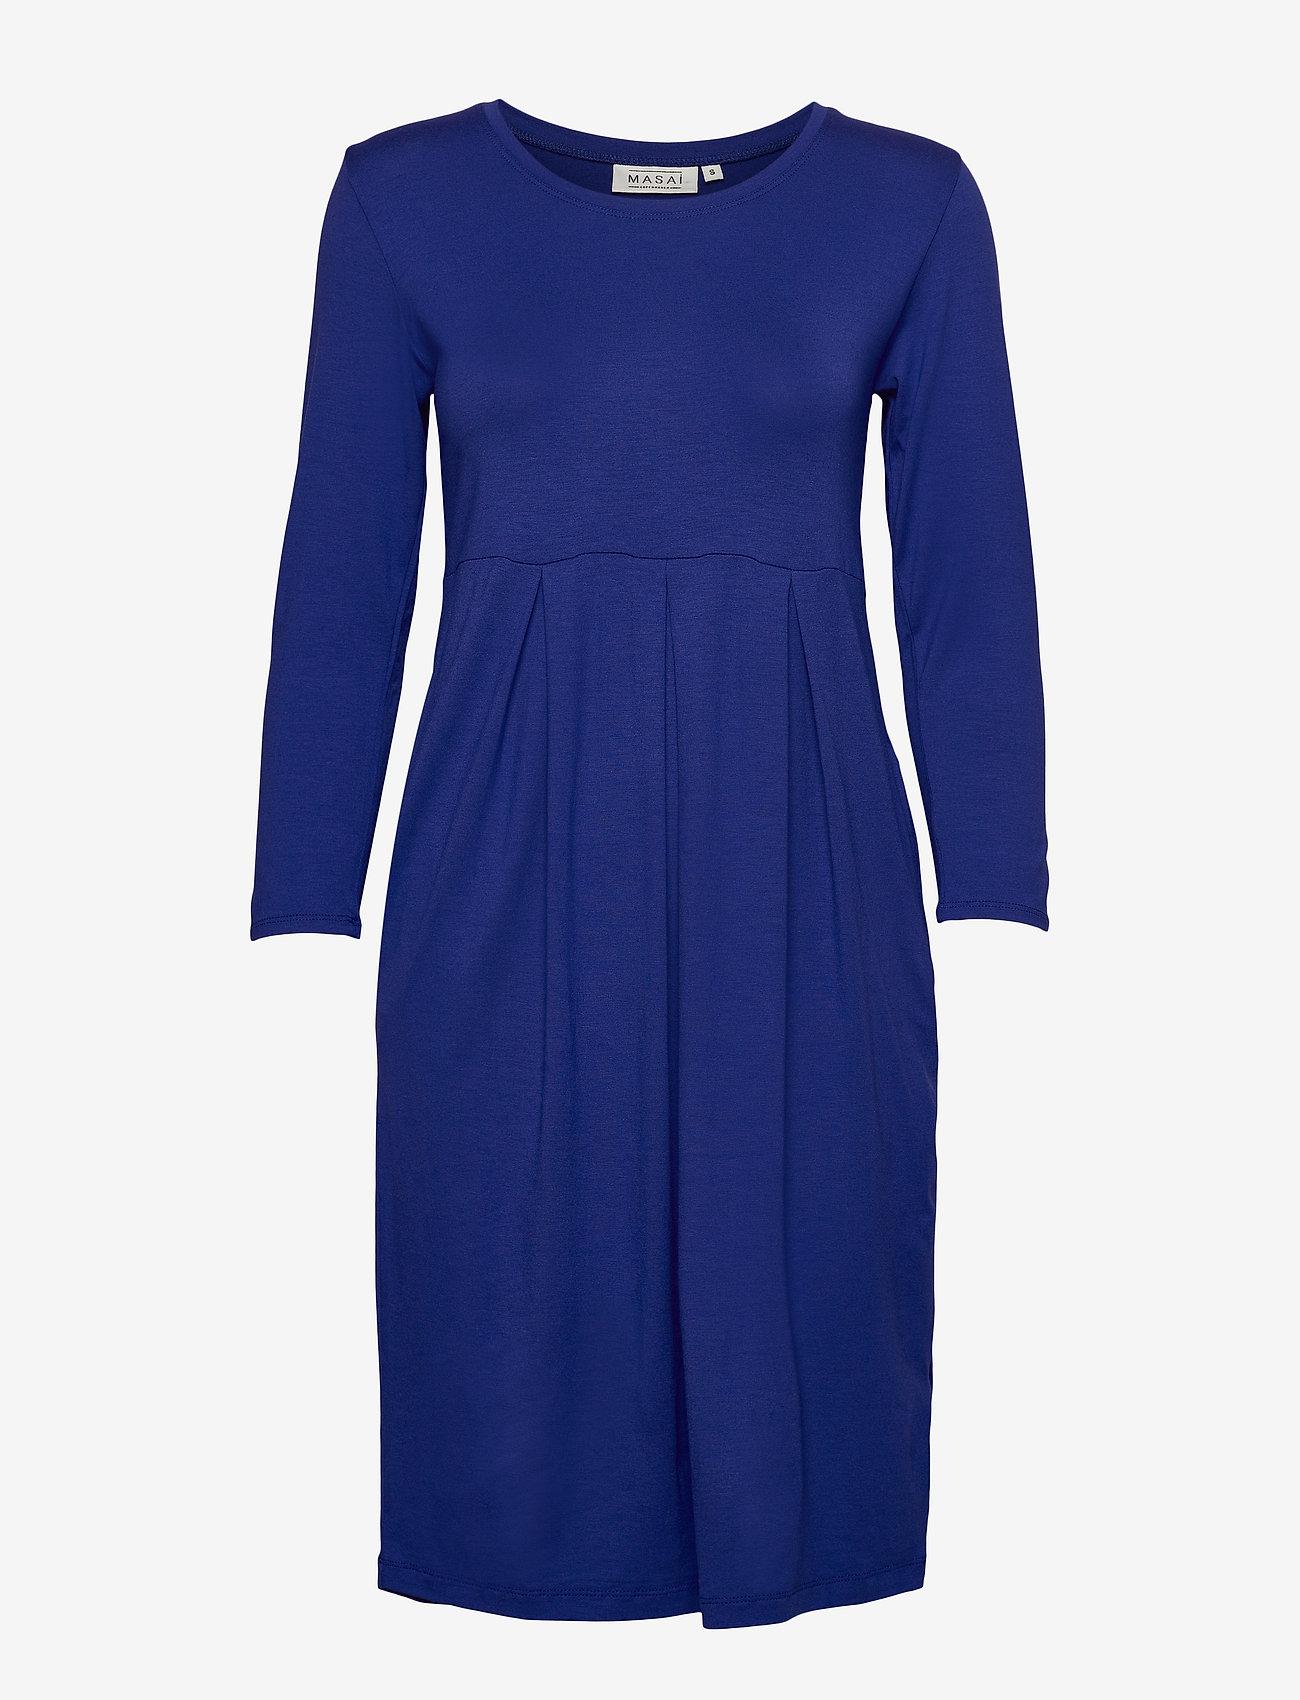 Masai - Noma - sukienki na codzień - clematis blue - 1